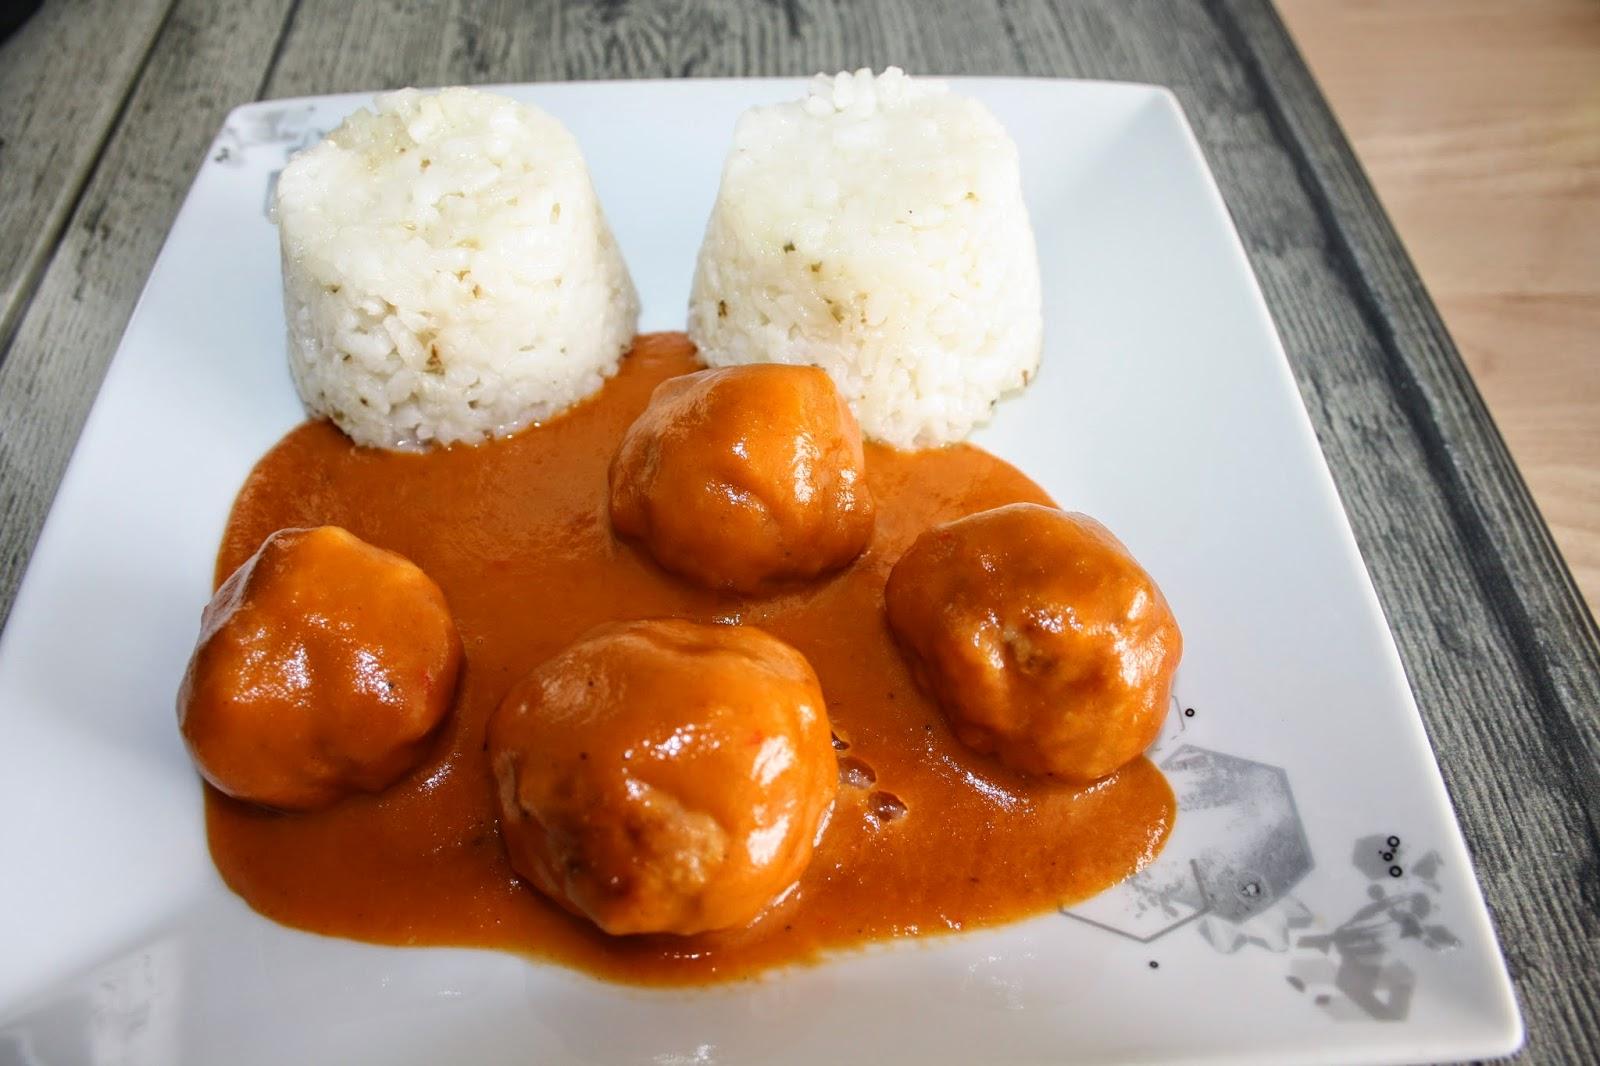 Alb ndigas con salsa de tomate al ron con guarnici n de - Guarnicion para albondigas ...